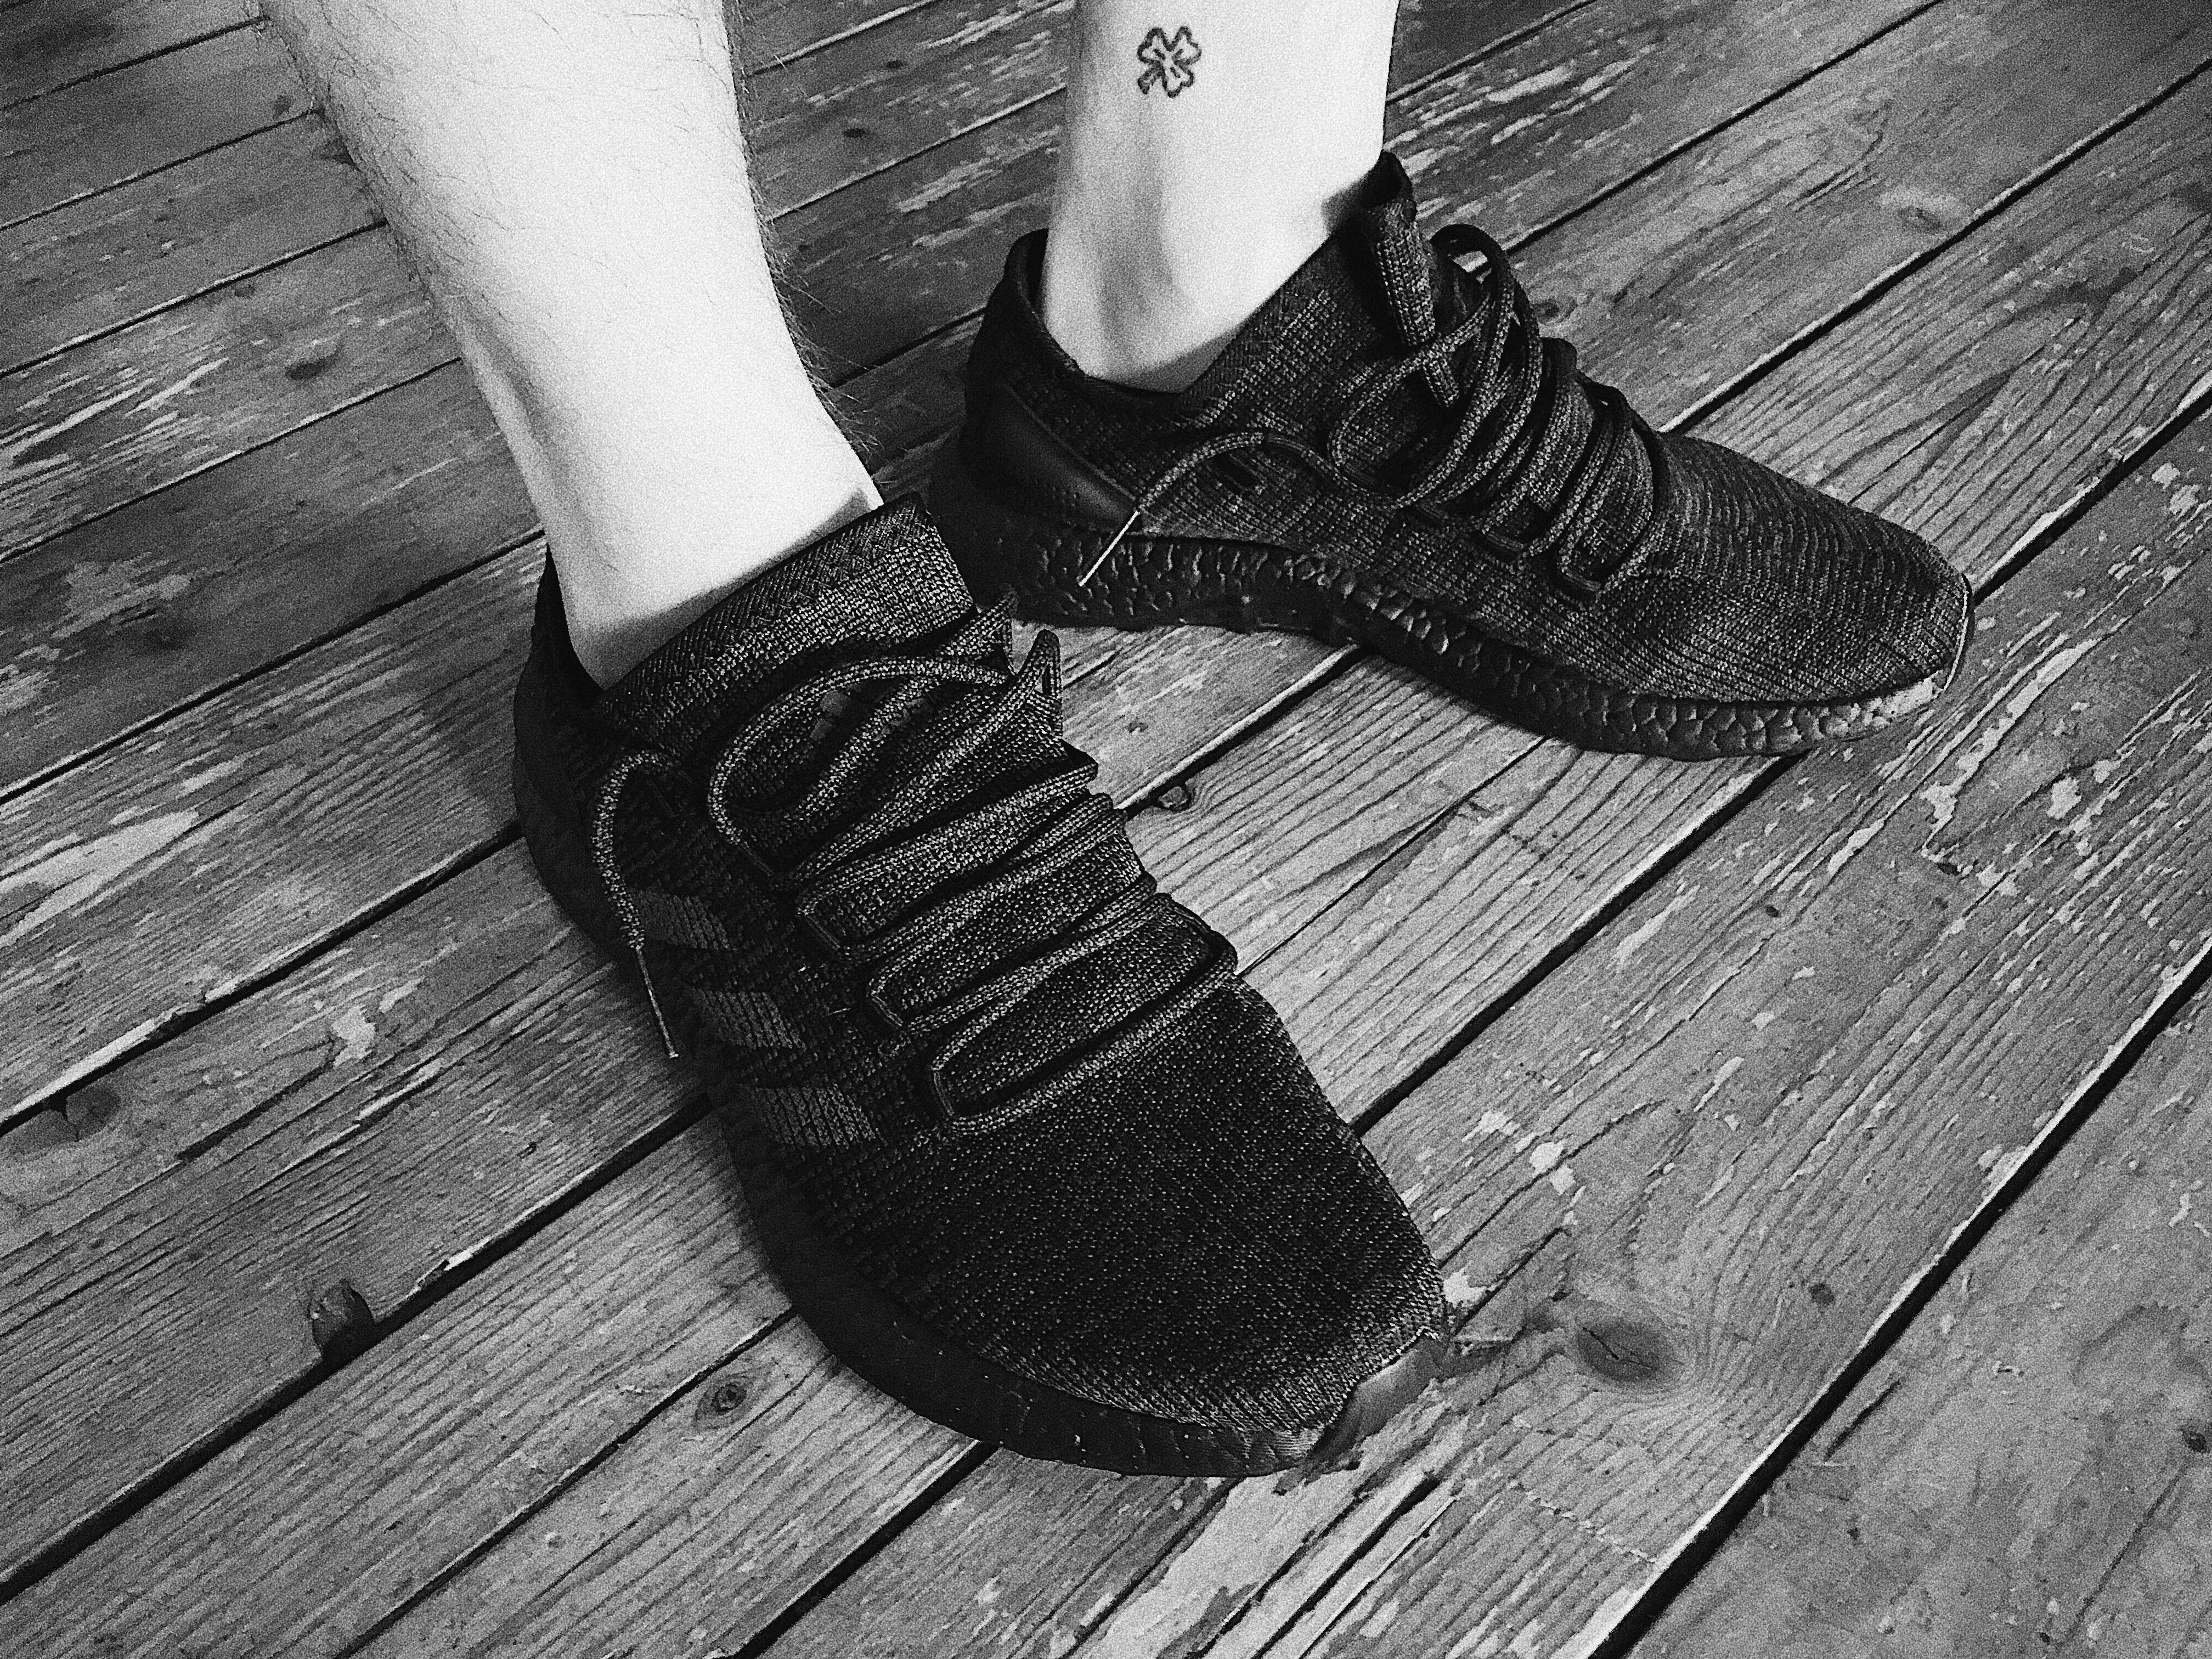 Adidas Pure Boost LTD 2017 Triple Black on feet above